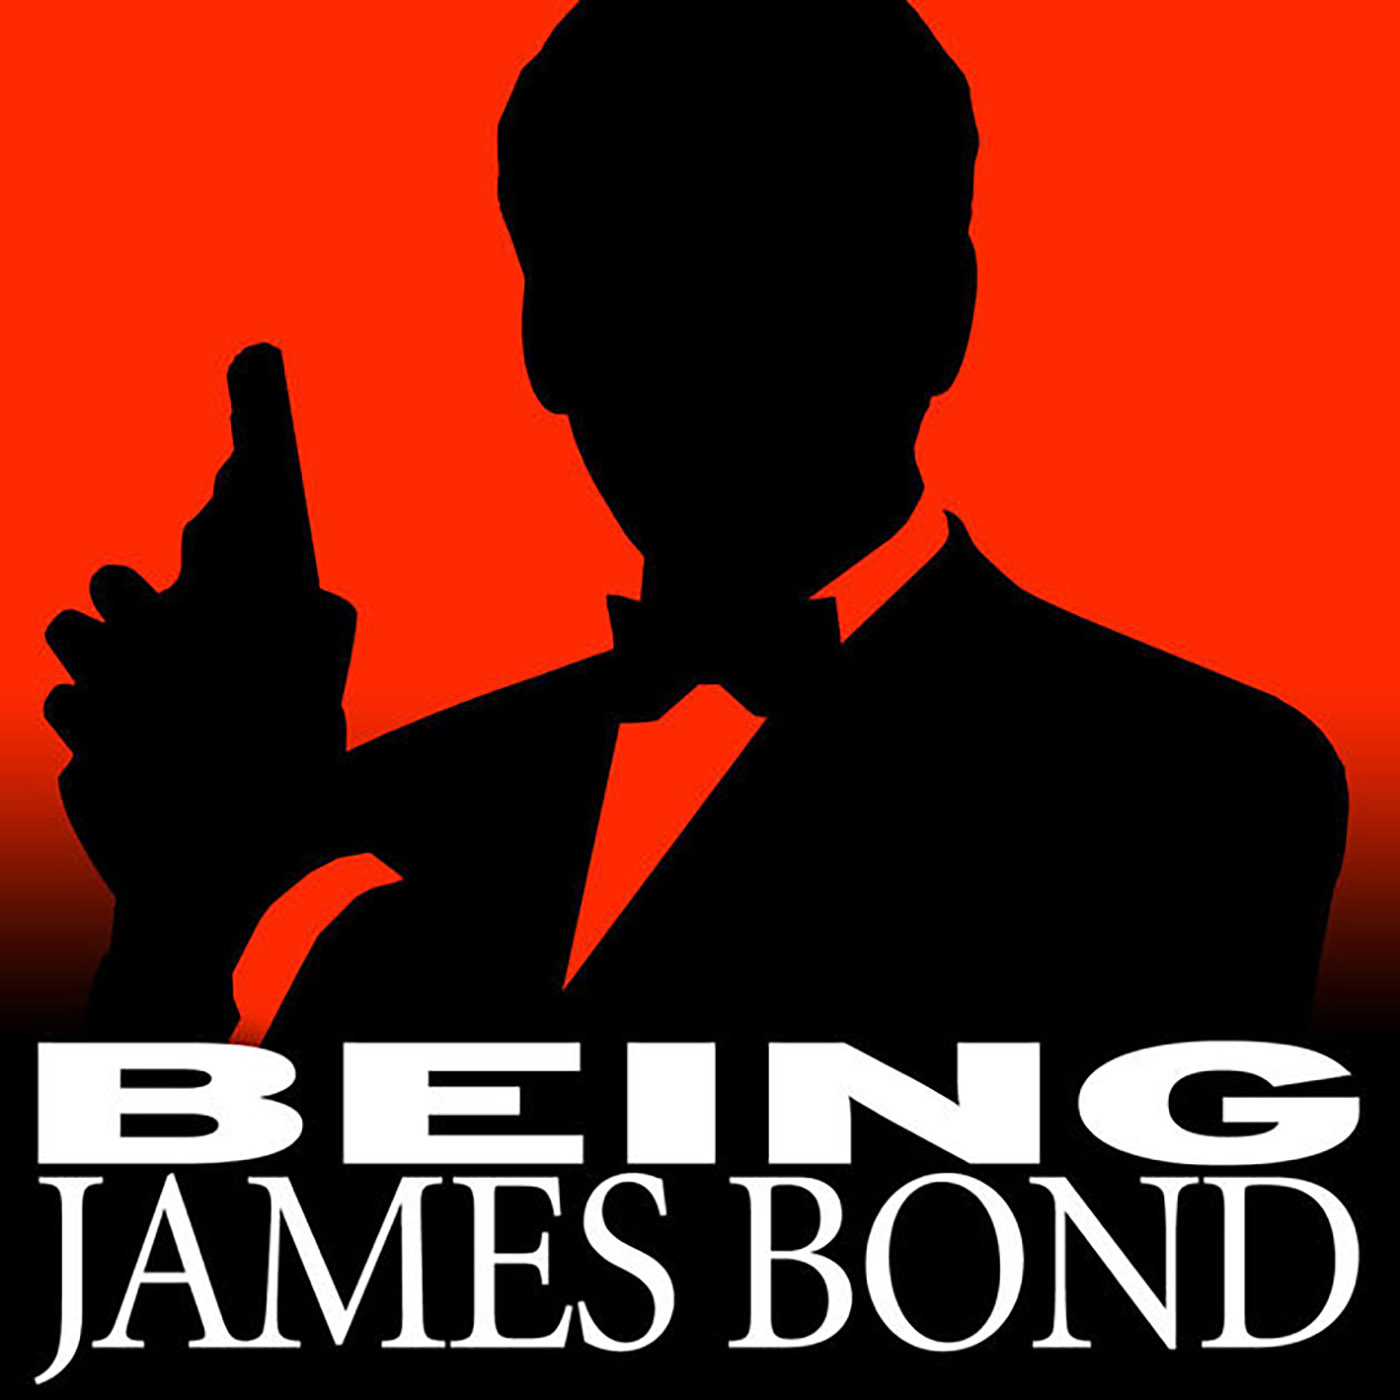 Episode 230 - The 'Bond Bulletin' Survey Results